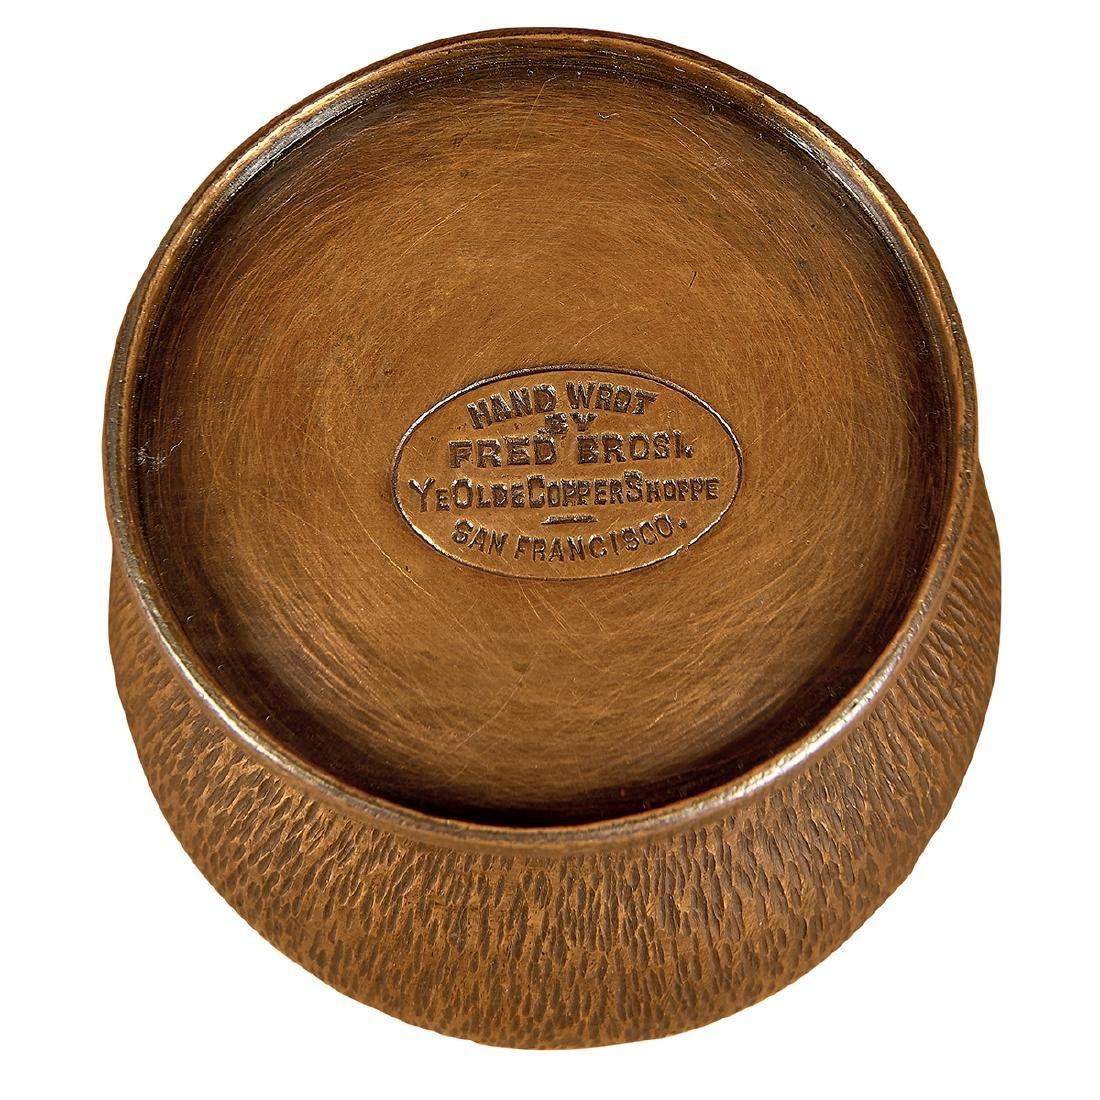 Brosi Ye Olde Copper Shoppe bowl, match holder - 2